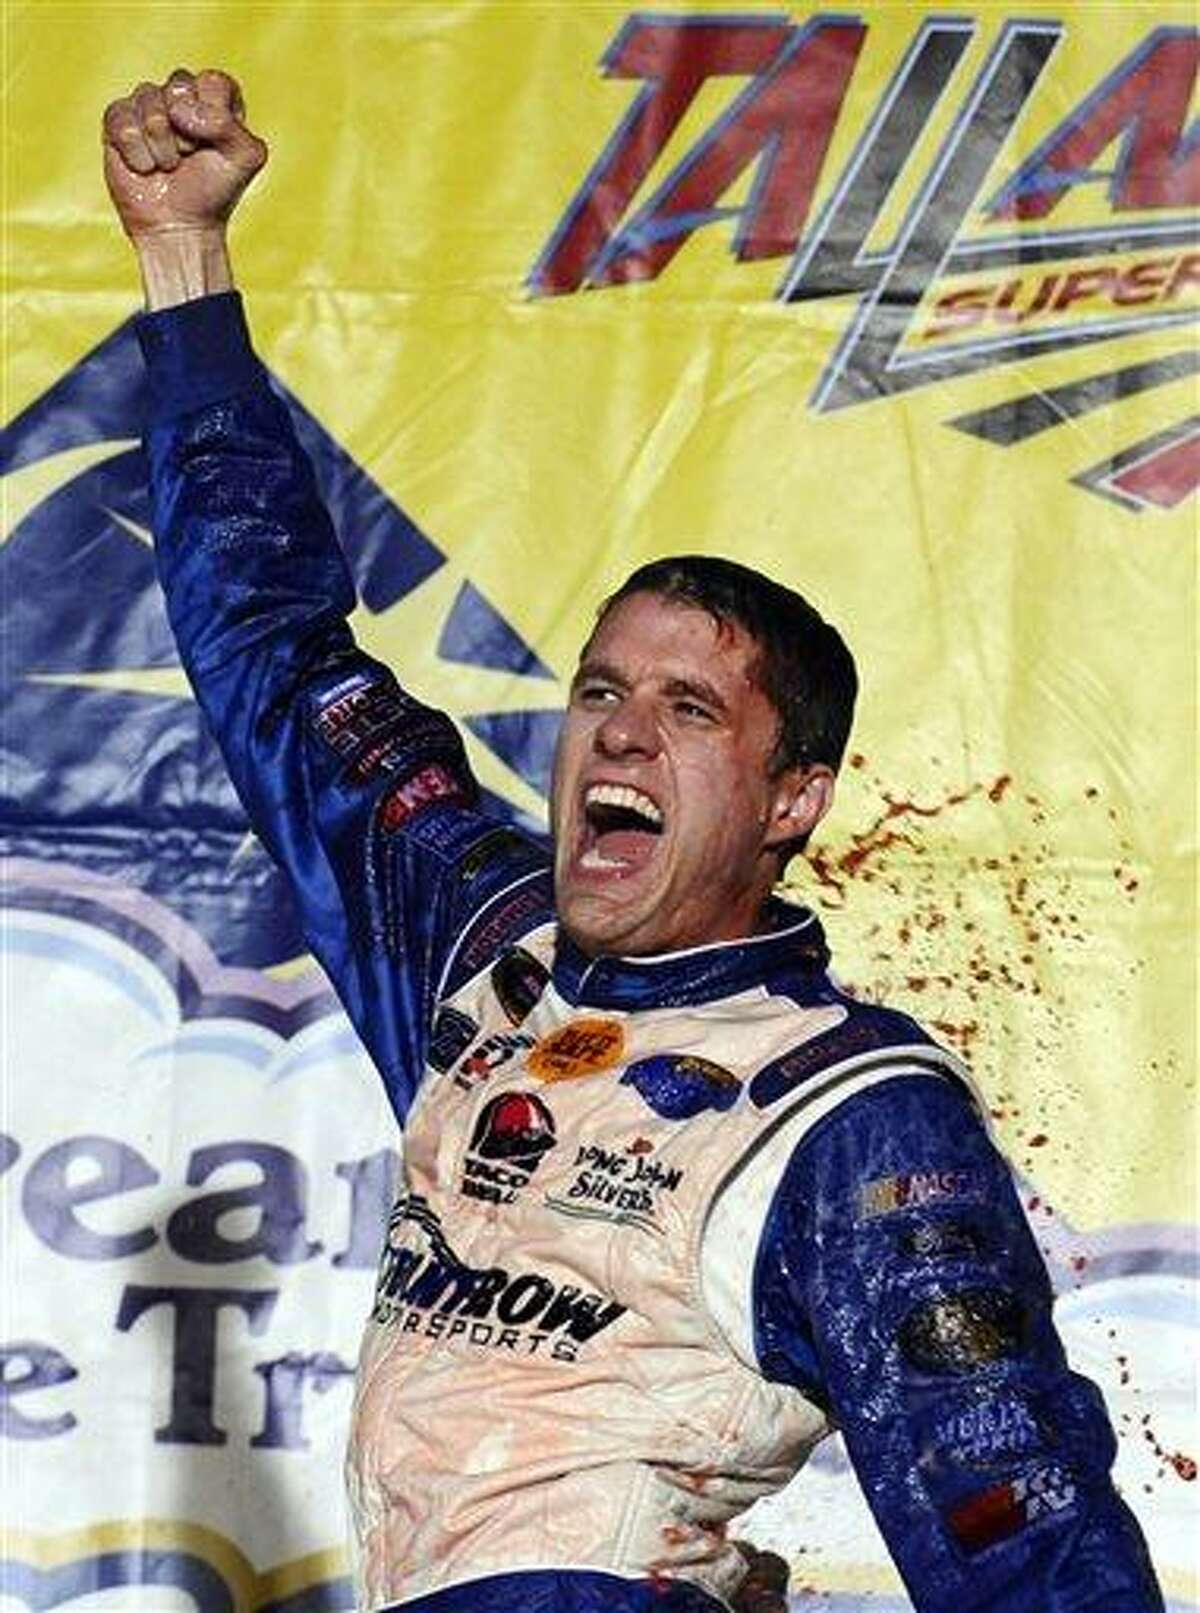 David Ragan celebrates after winning the NASCAR Sprint Cup Series Aaron's 499 auto race at Talladega Superspeedway in Talladega, Ala., Sunday, May 5, 2013. (AP Photo/Rainier Ehrhardt)